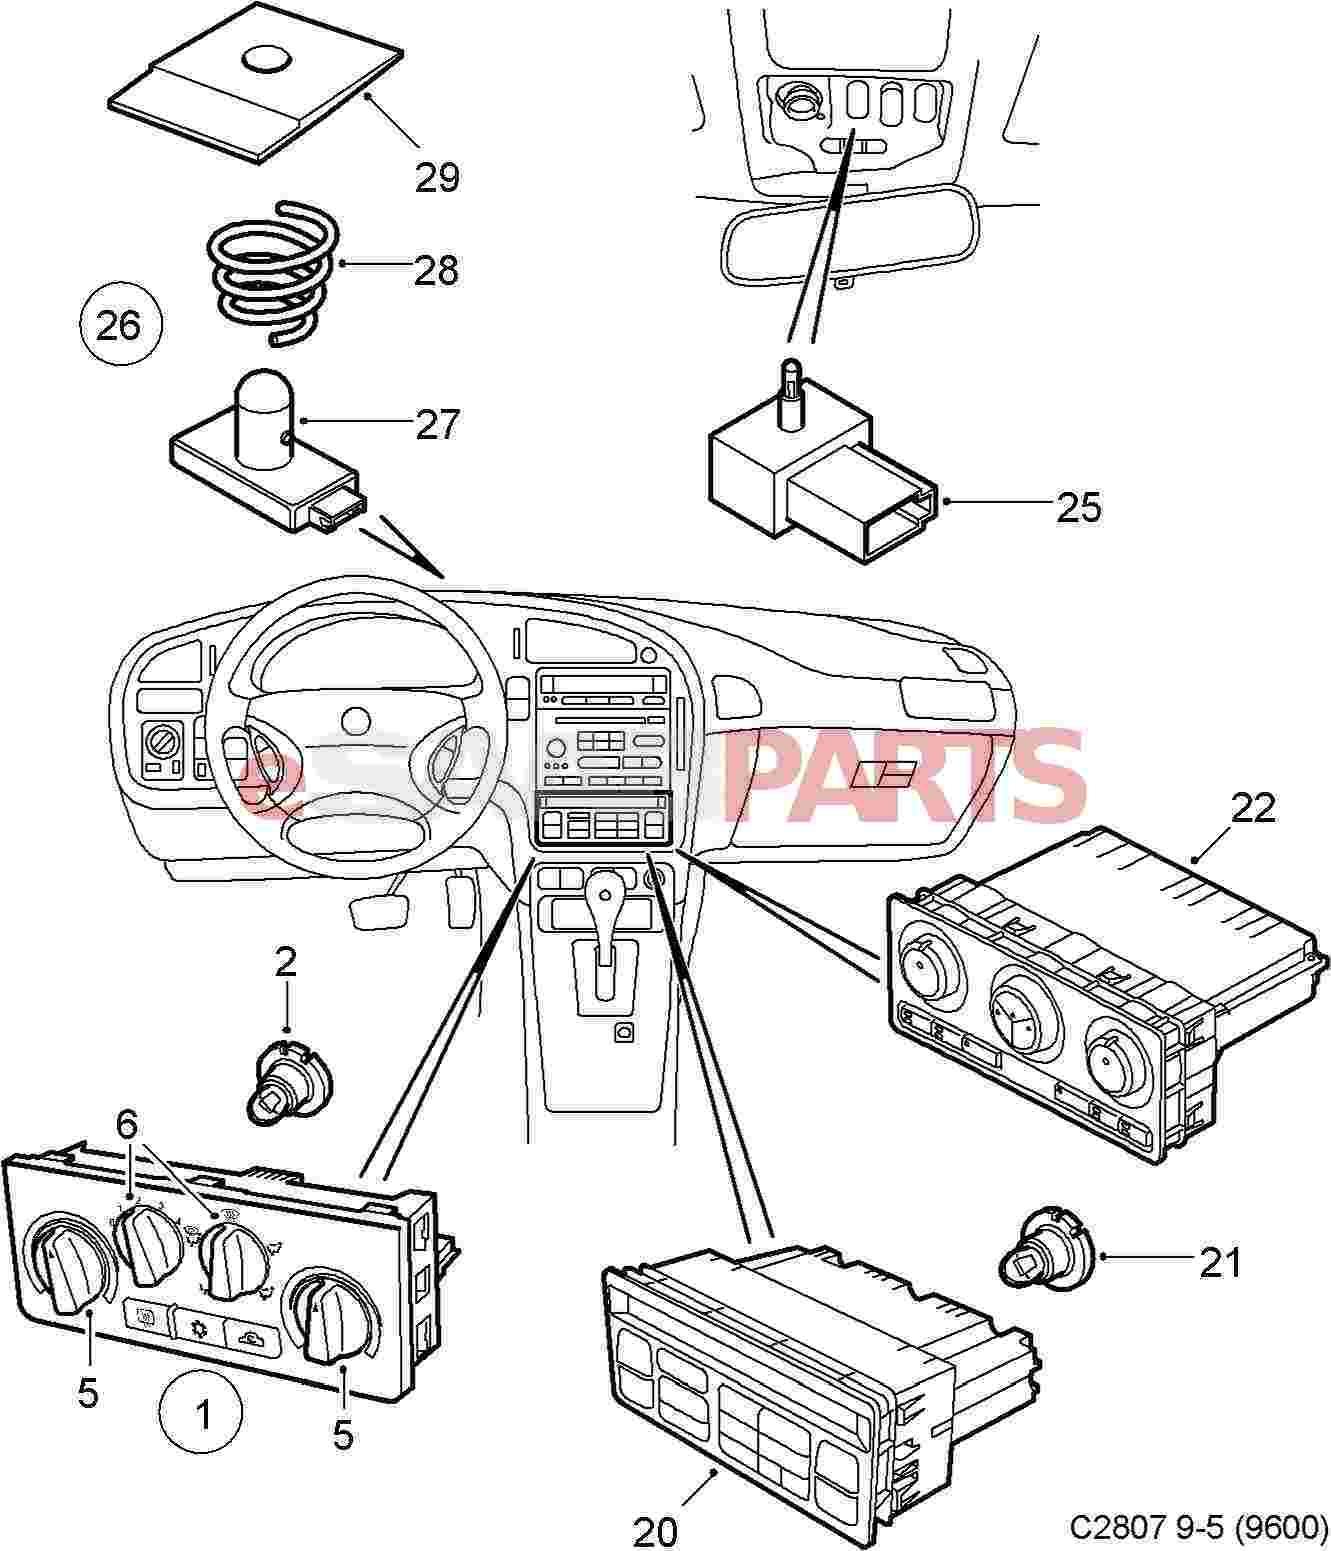 12785496] saab cabin temperature sensor genuine saab parts fromview all parts in diagram